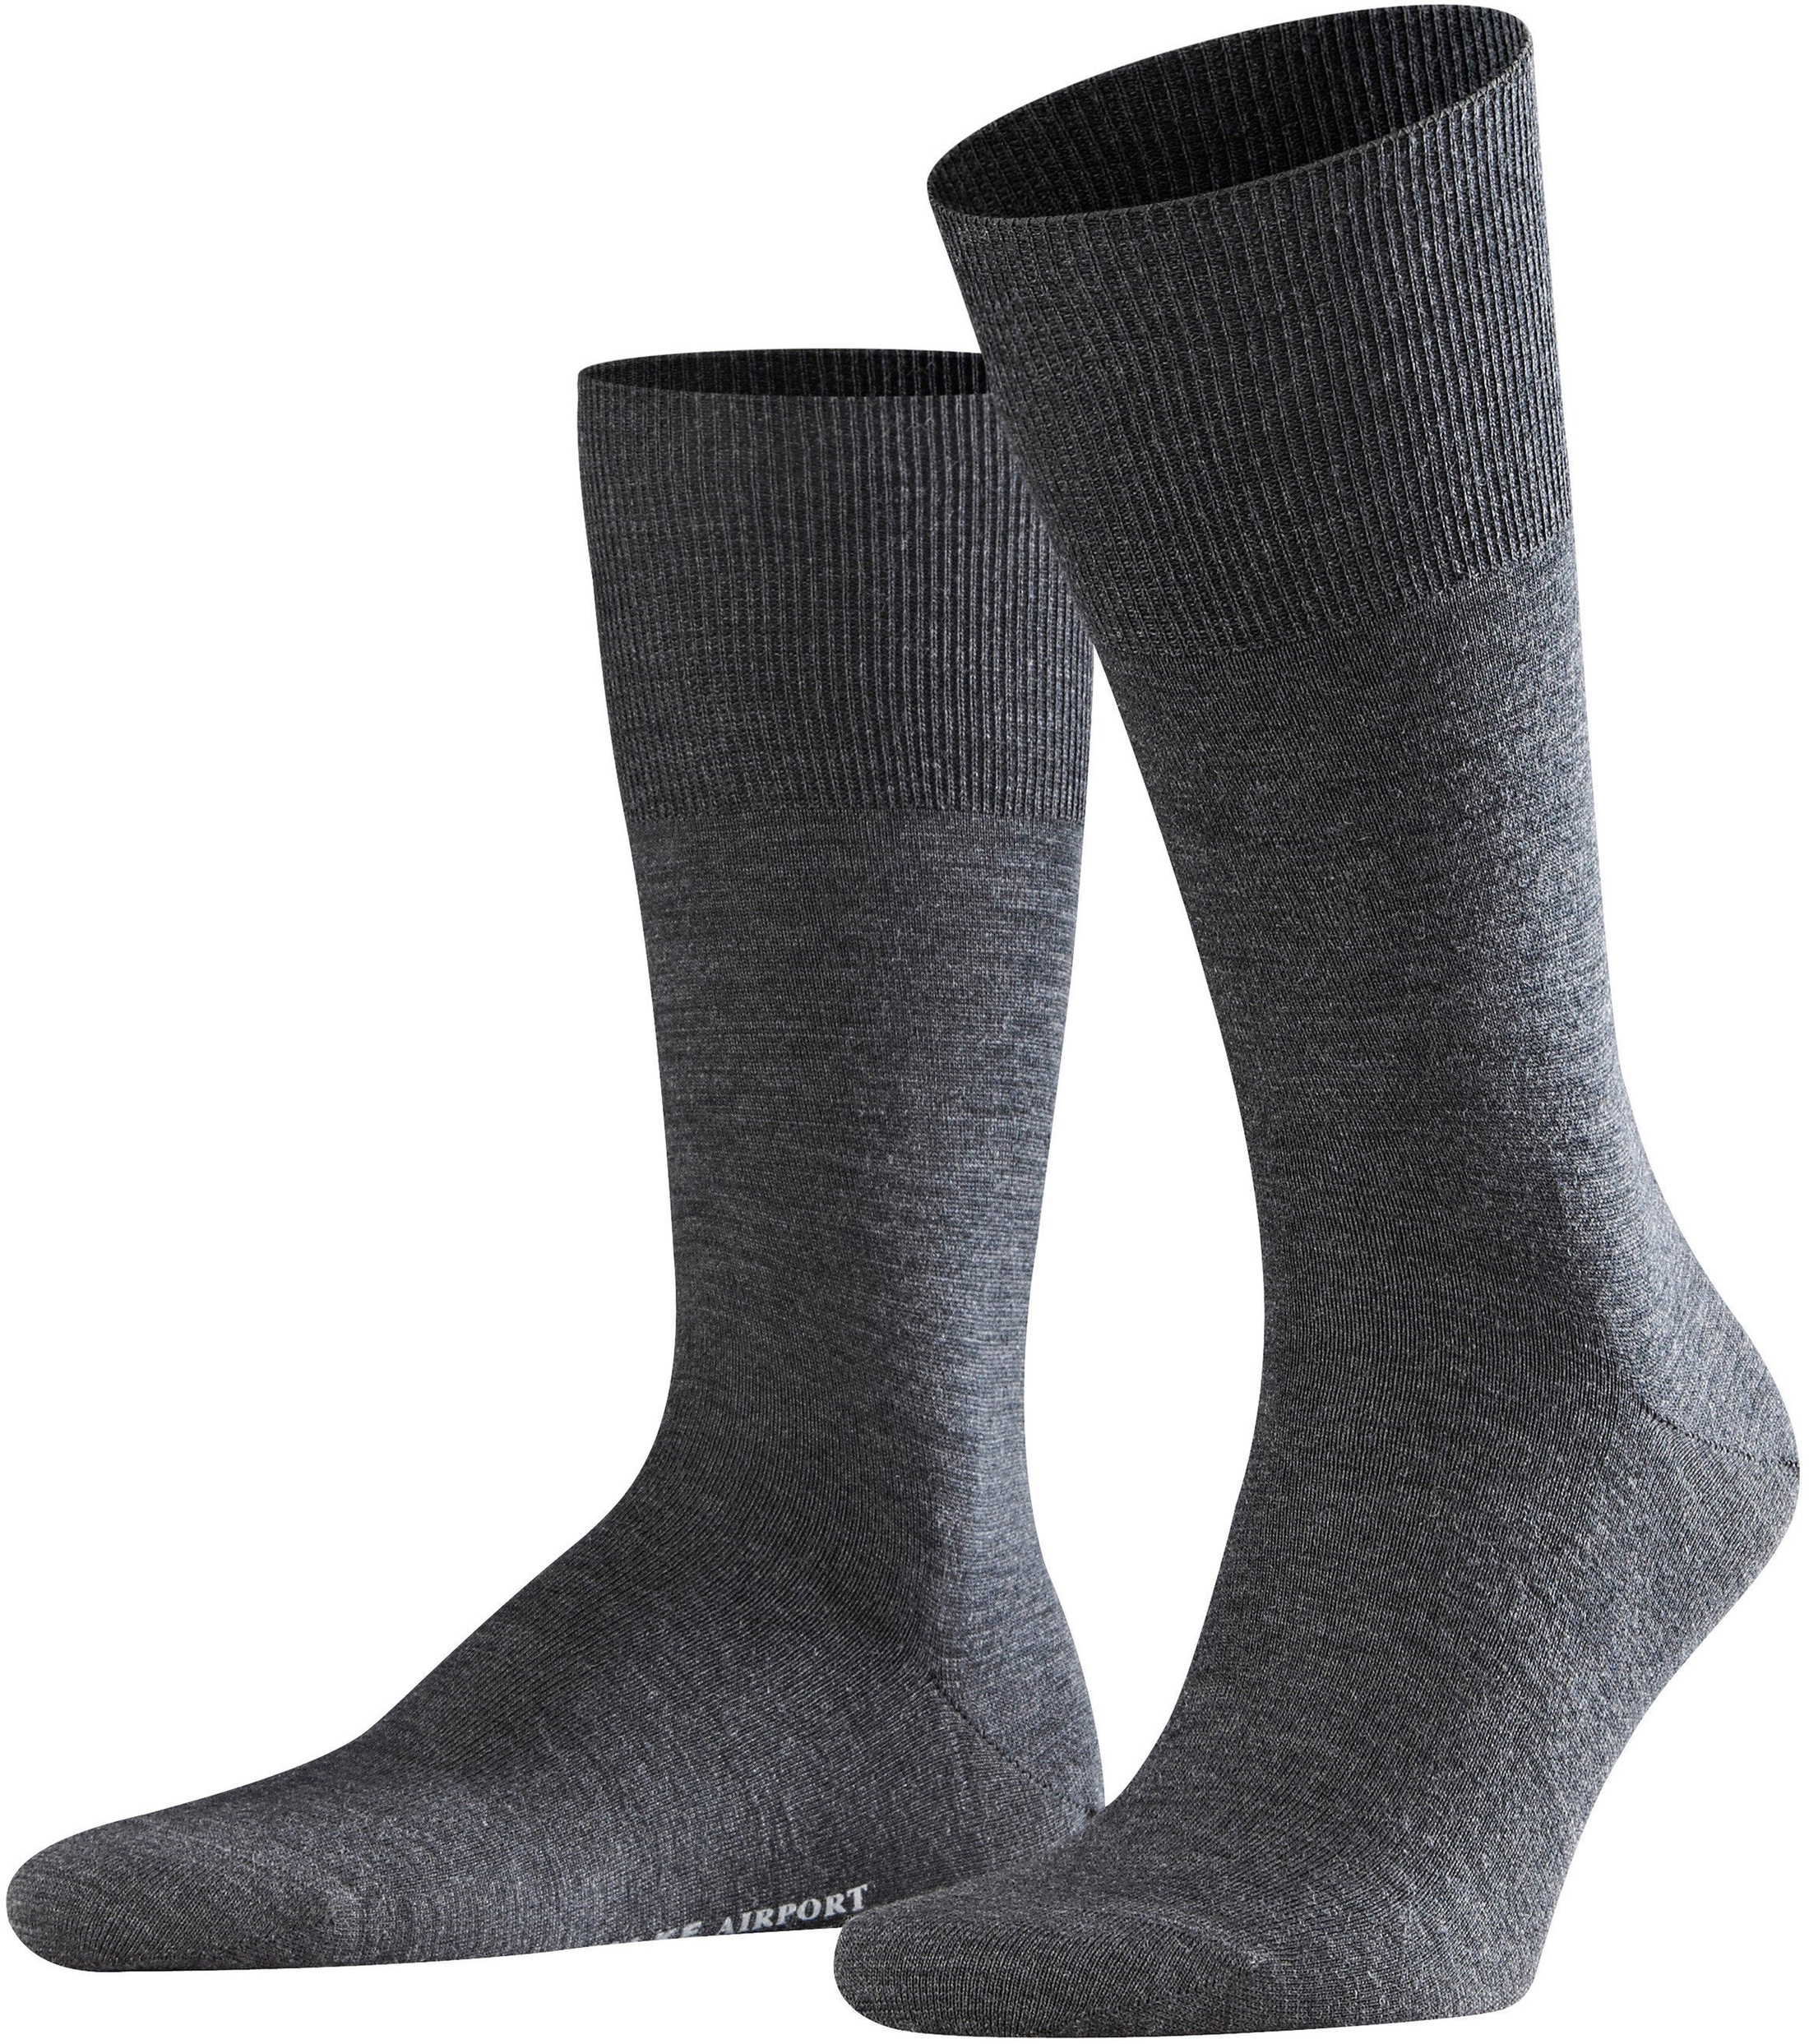 FALKE Airport Socken Asphalt 3180 foto 0